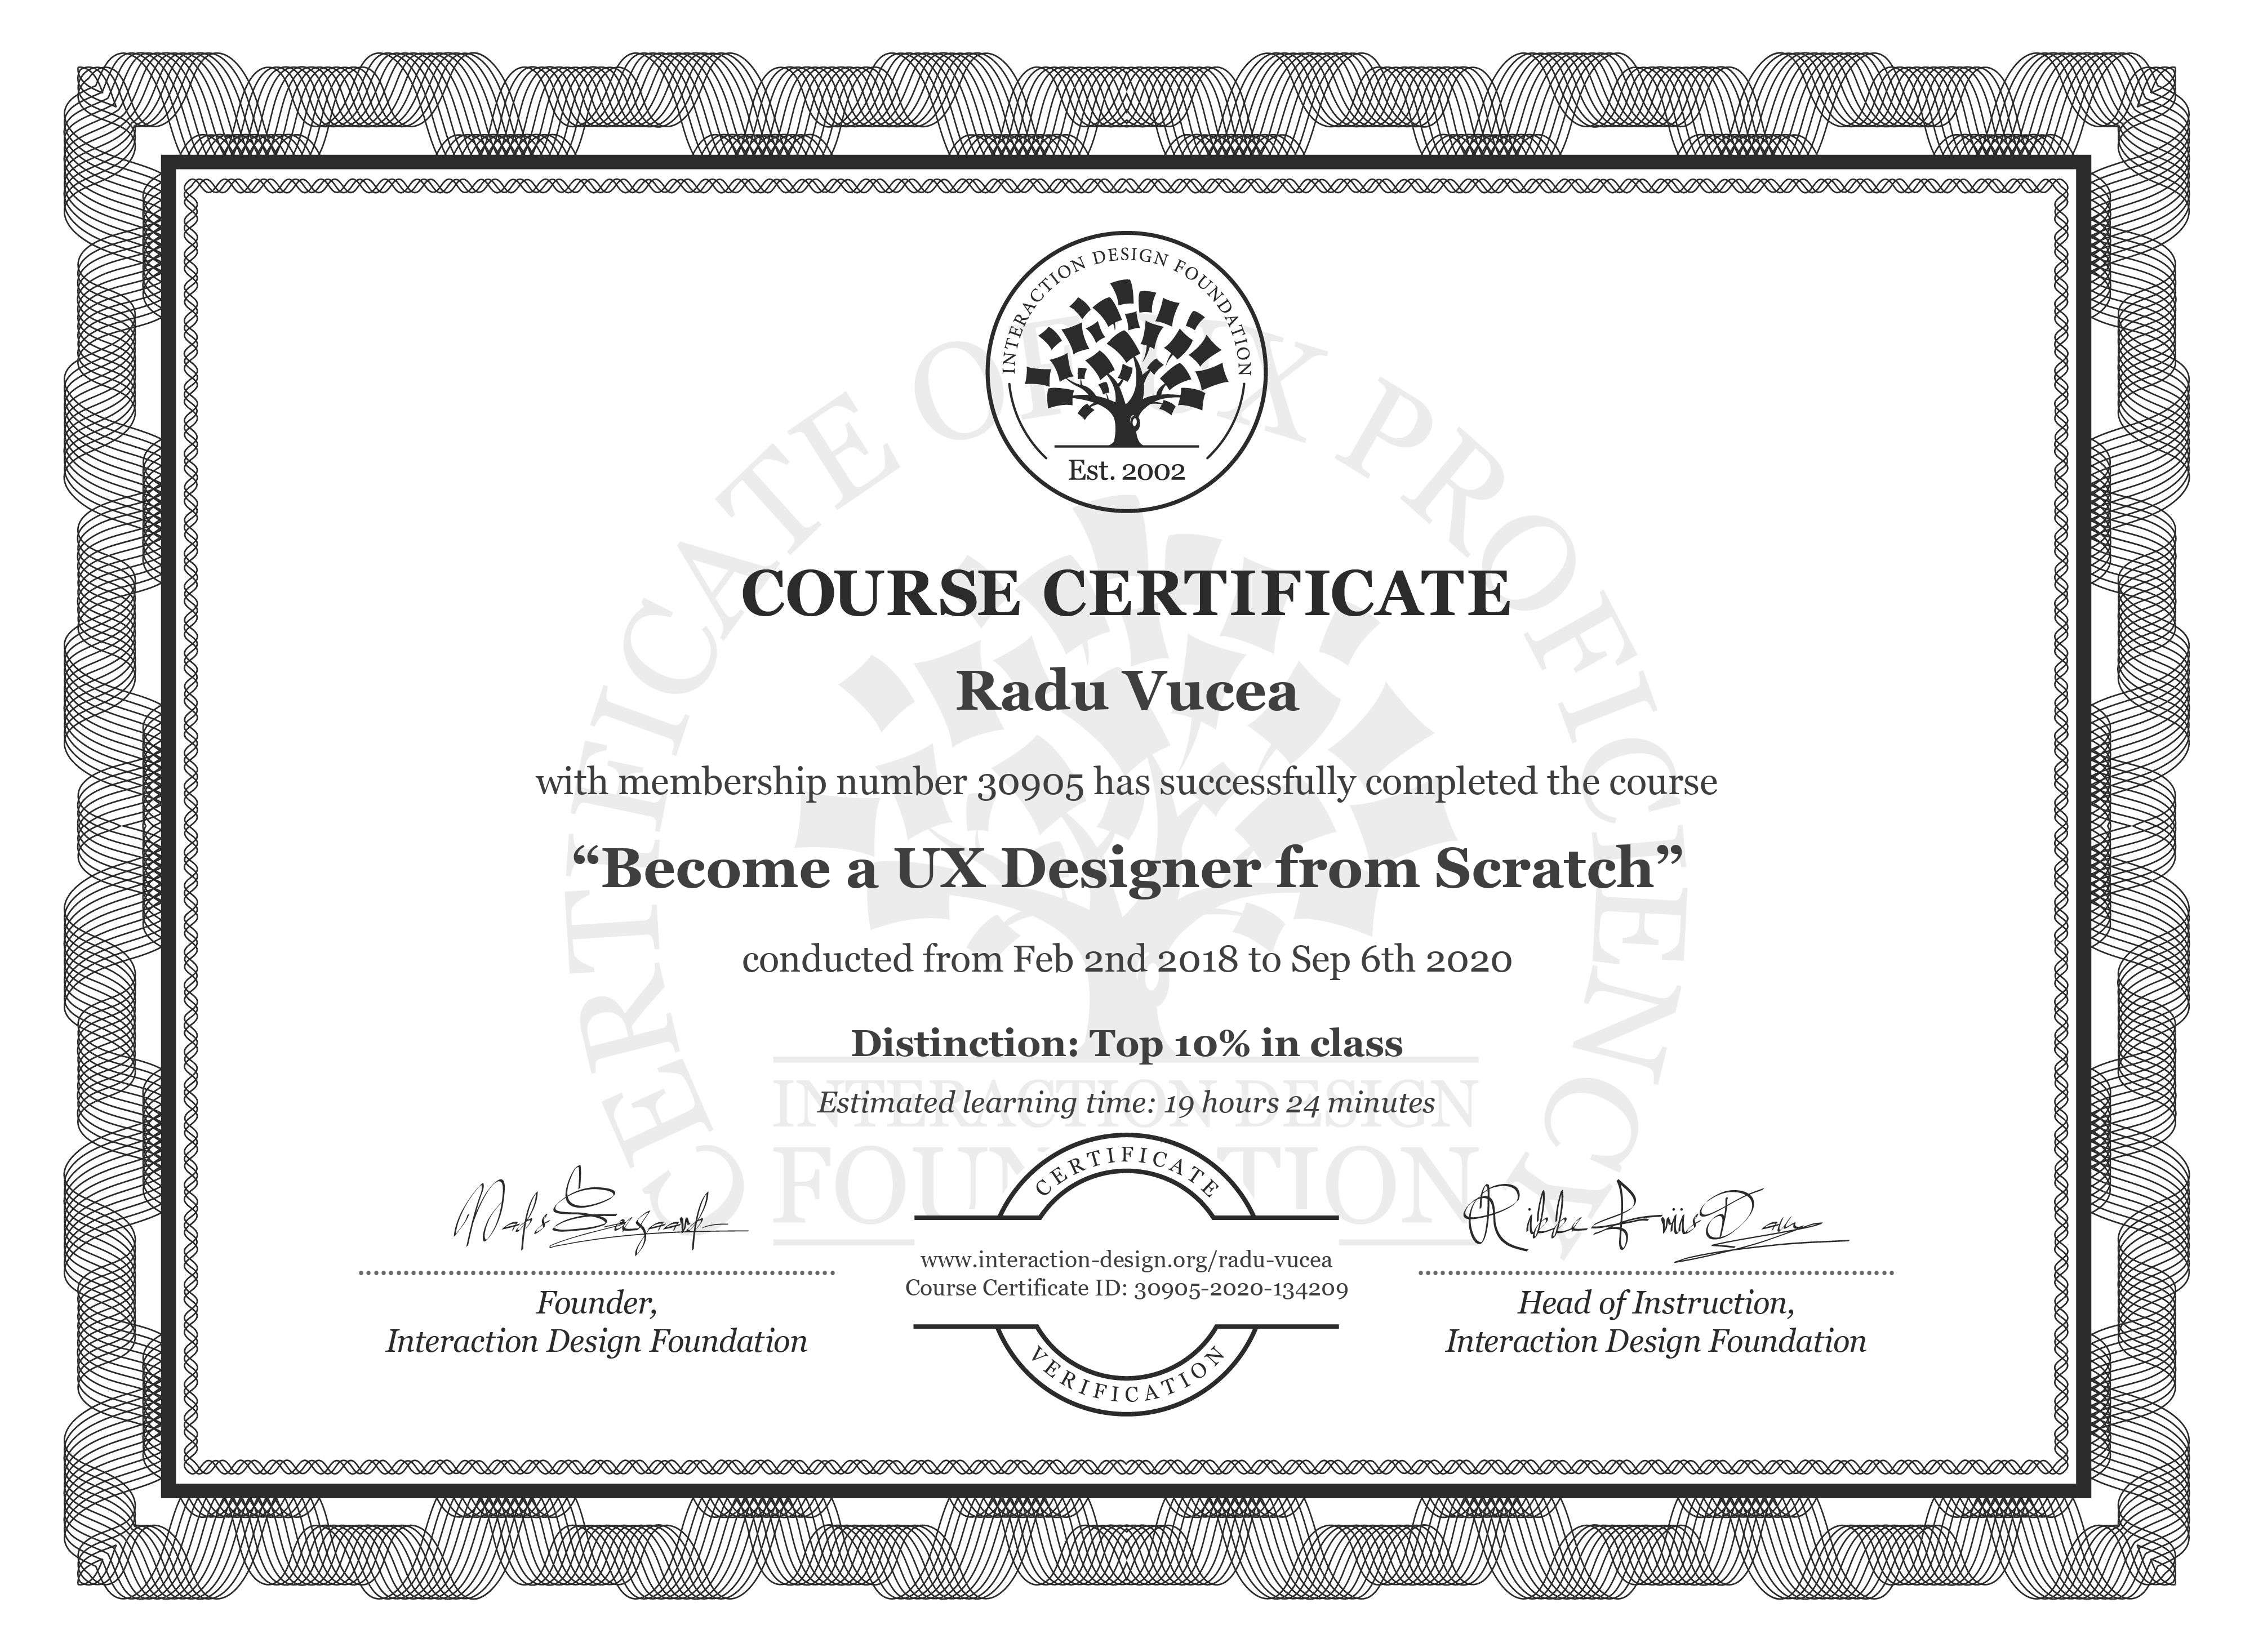 Radu Vucea's Course Certificate: User Experience: The Beginner's Guide